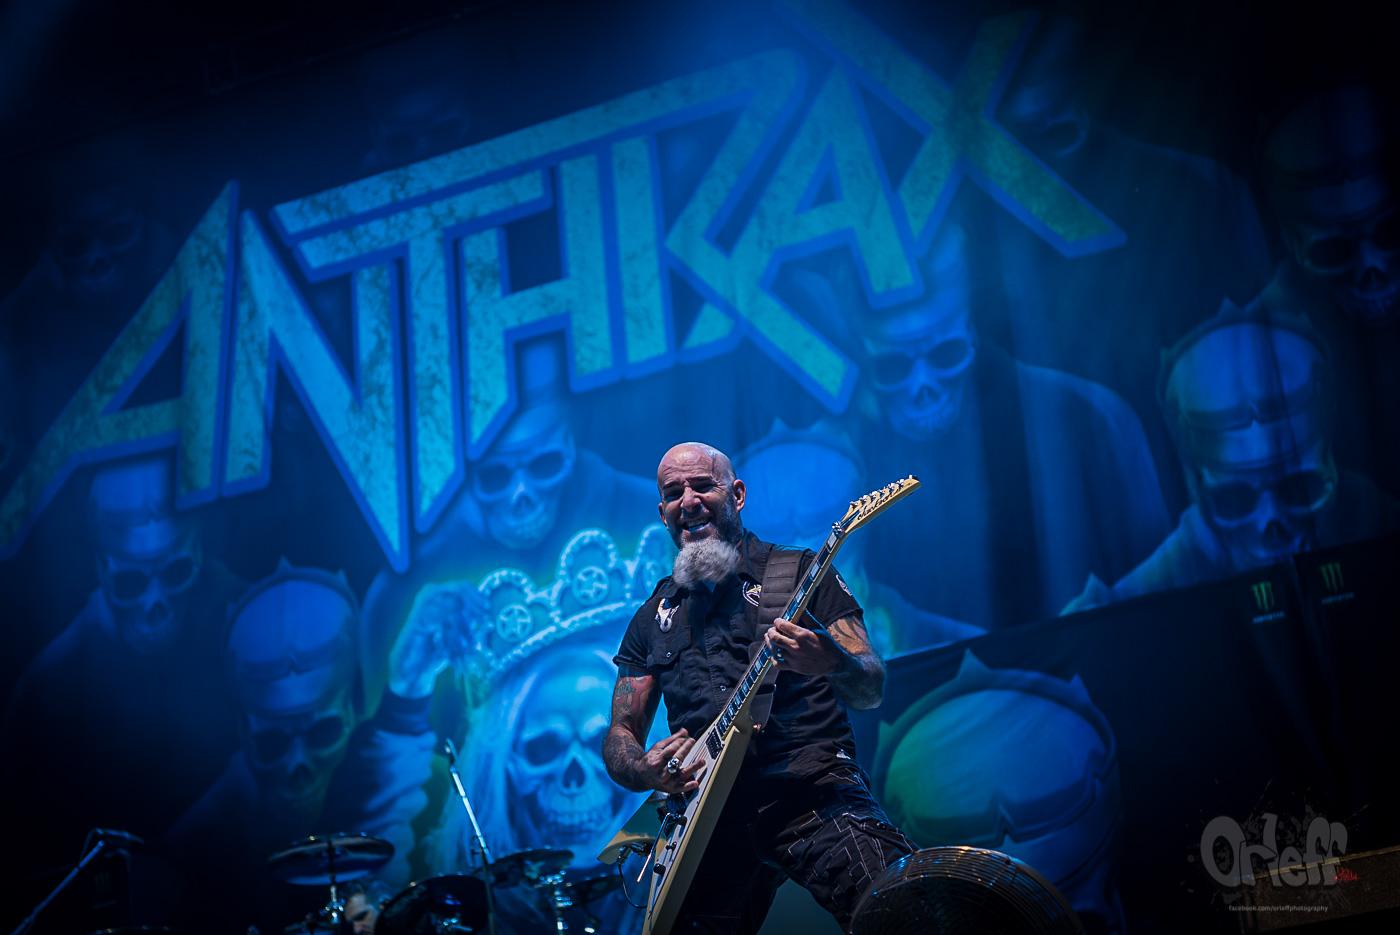 Anthrax @ Nova Rock 2019